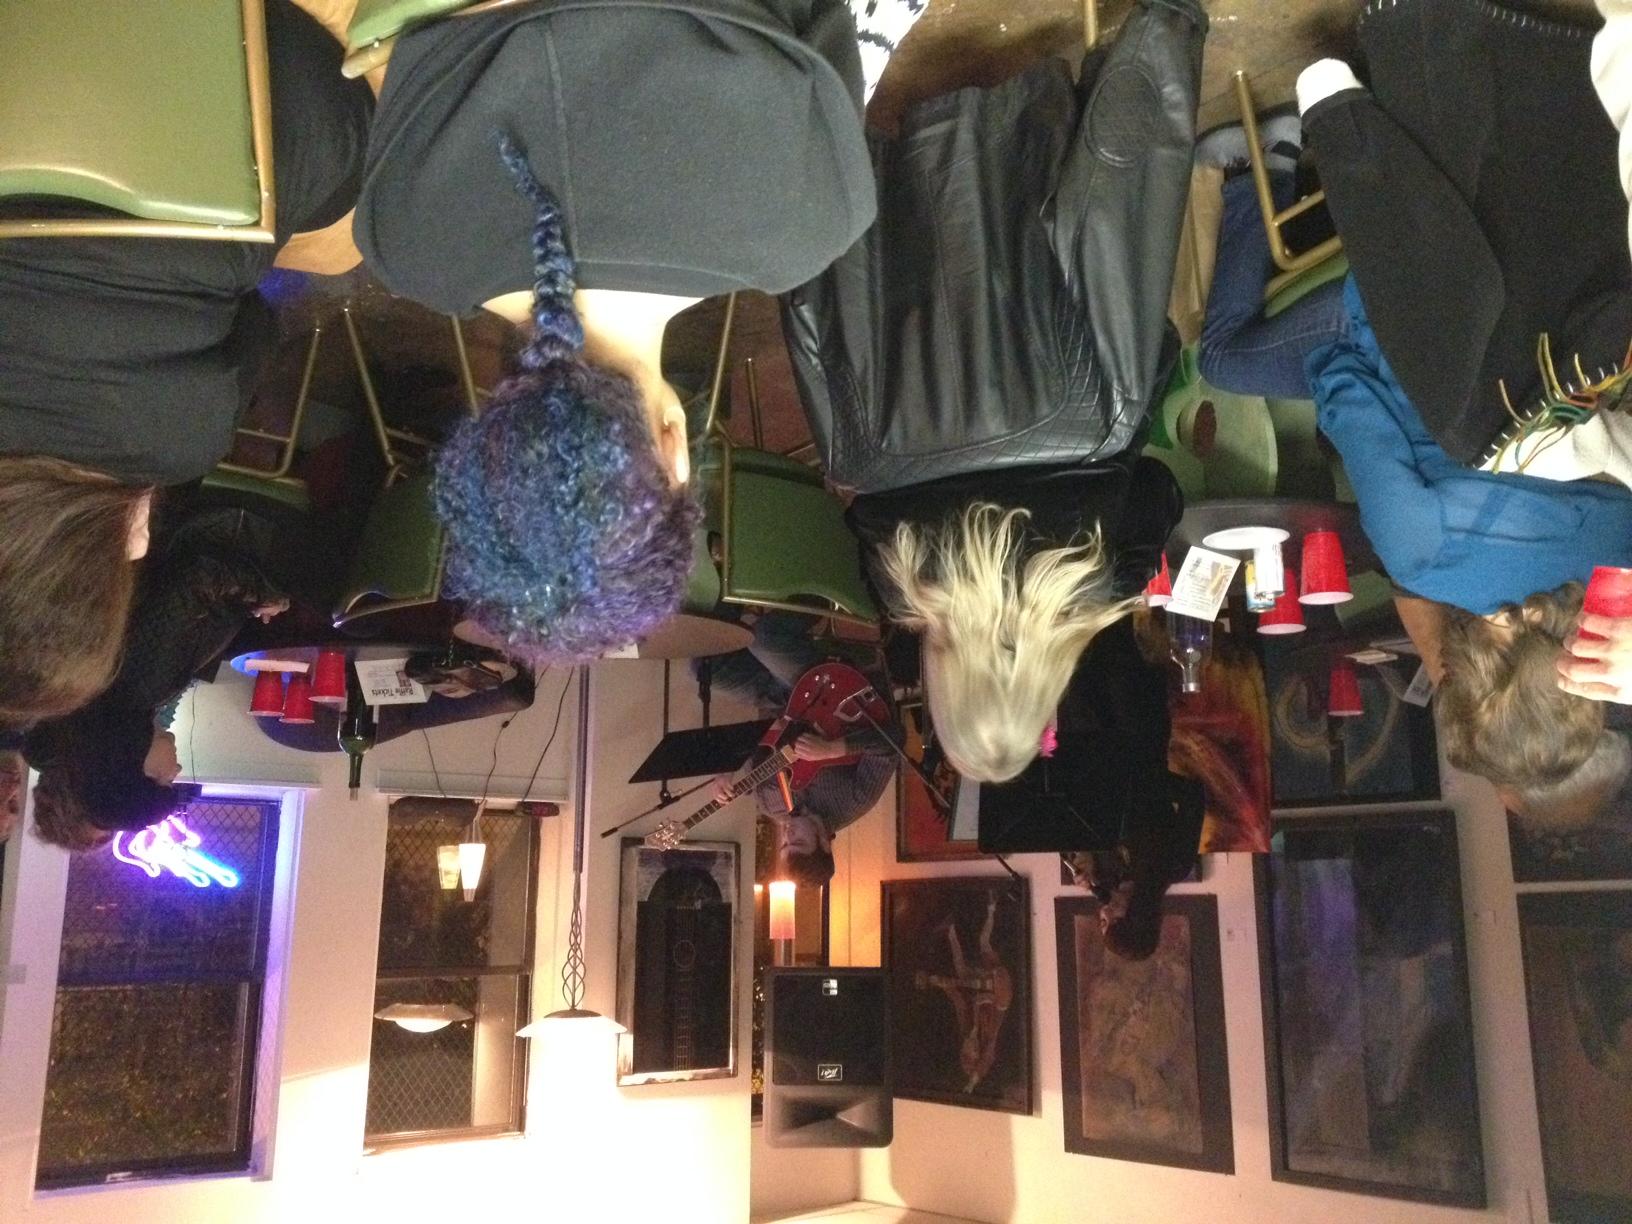 A Saturday night Jazz showcase featuring Justyna Biala and Jon Ross.